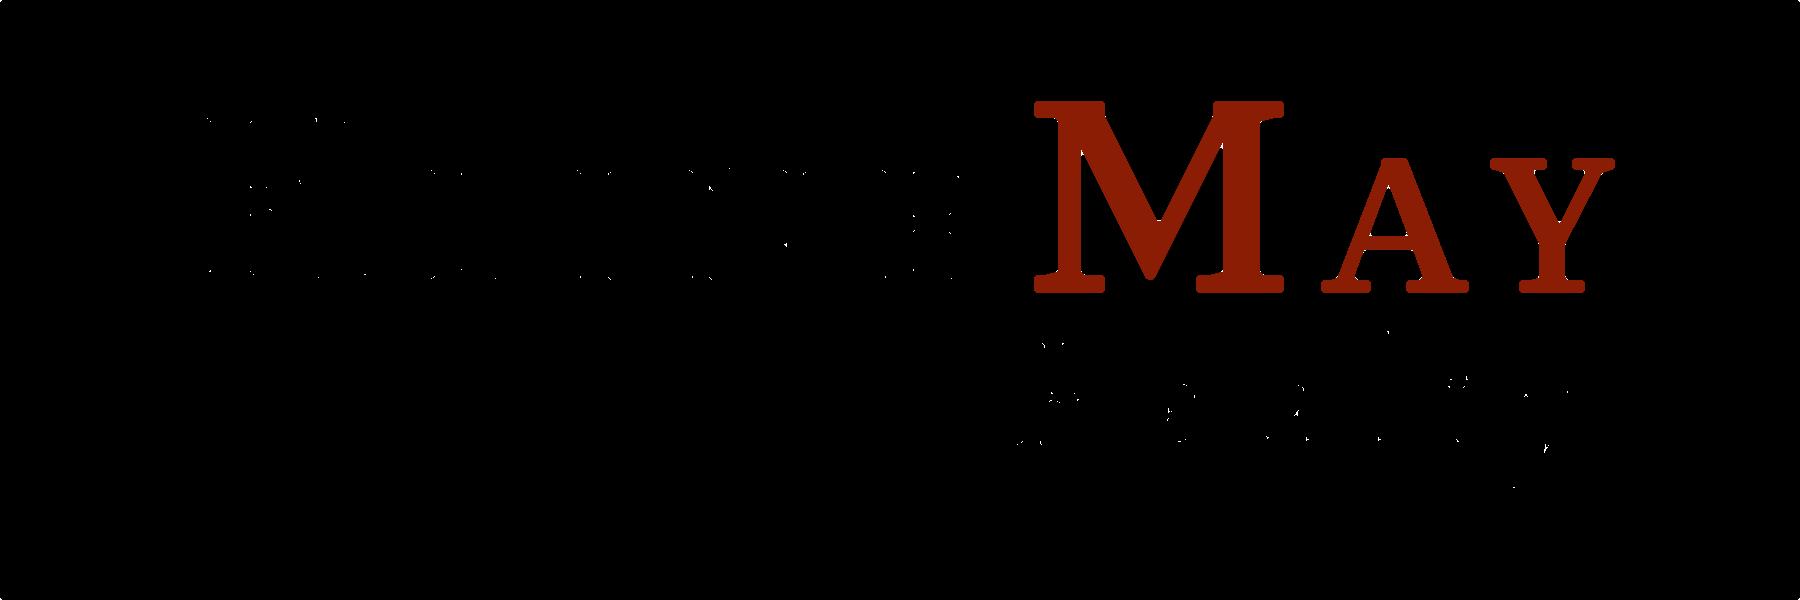 Kline-May-Logo (No background)